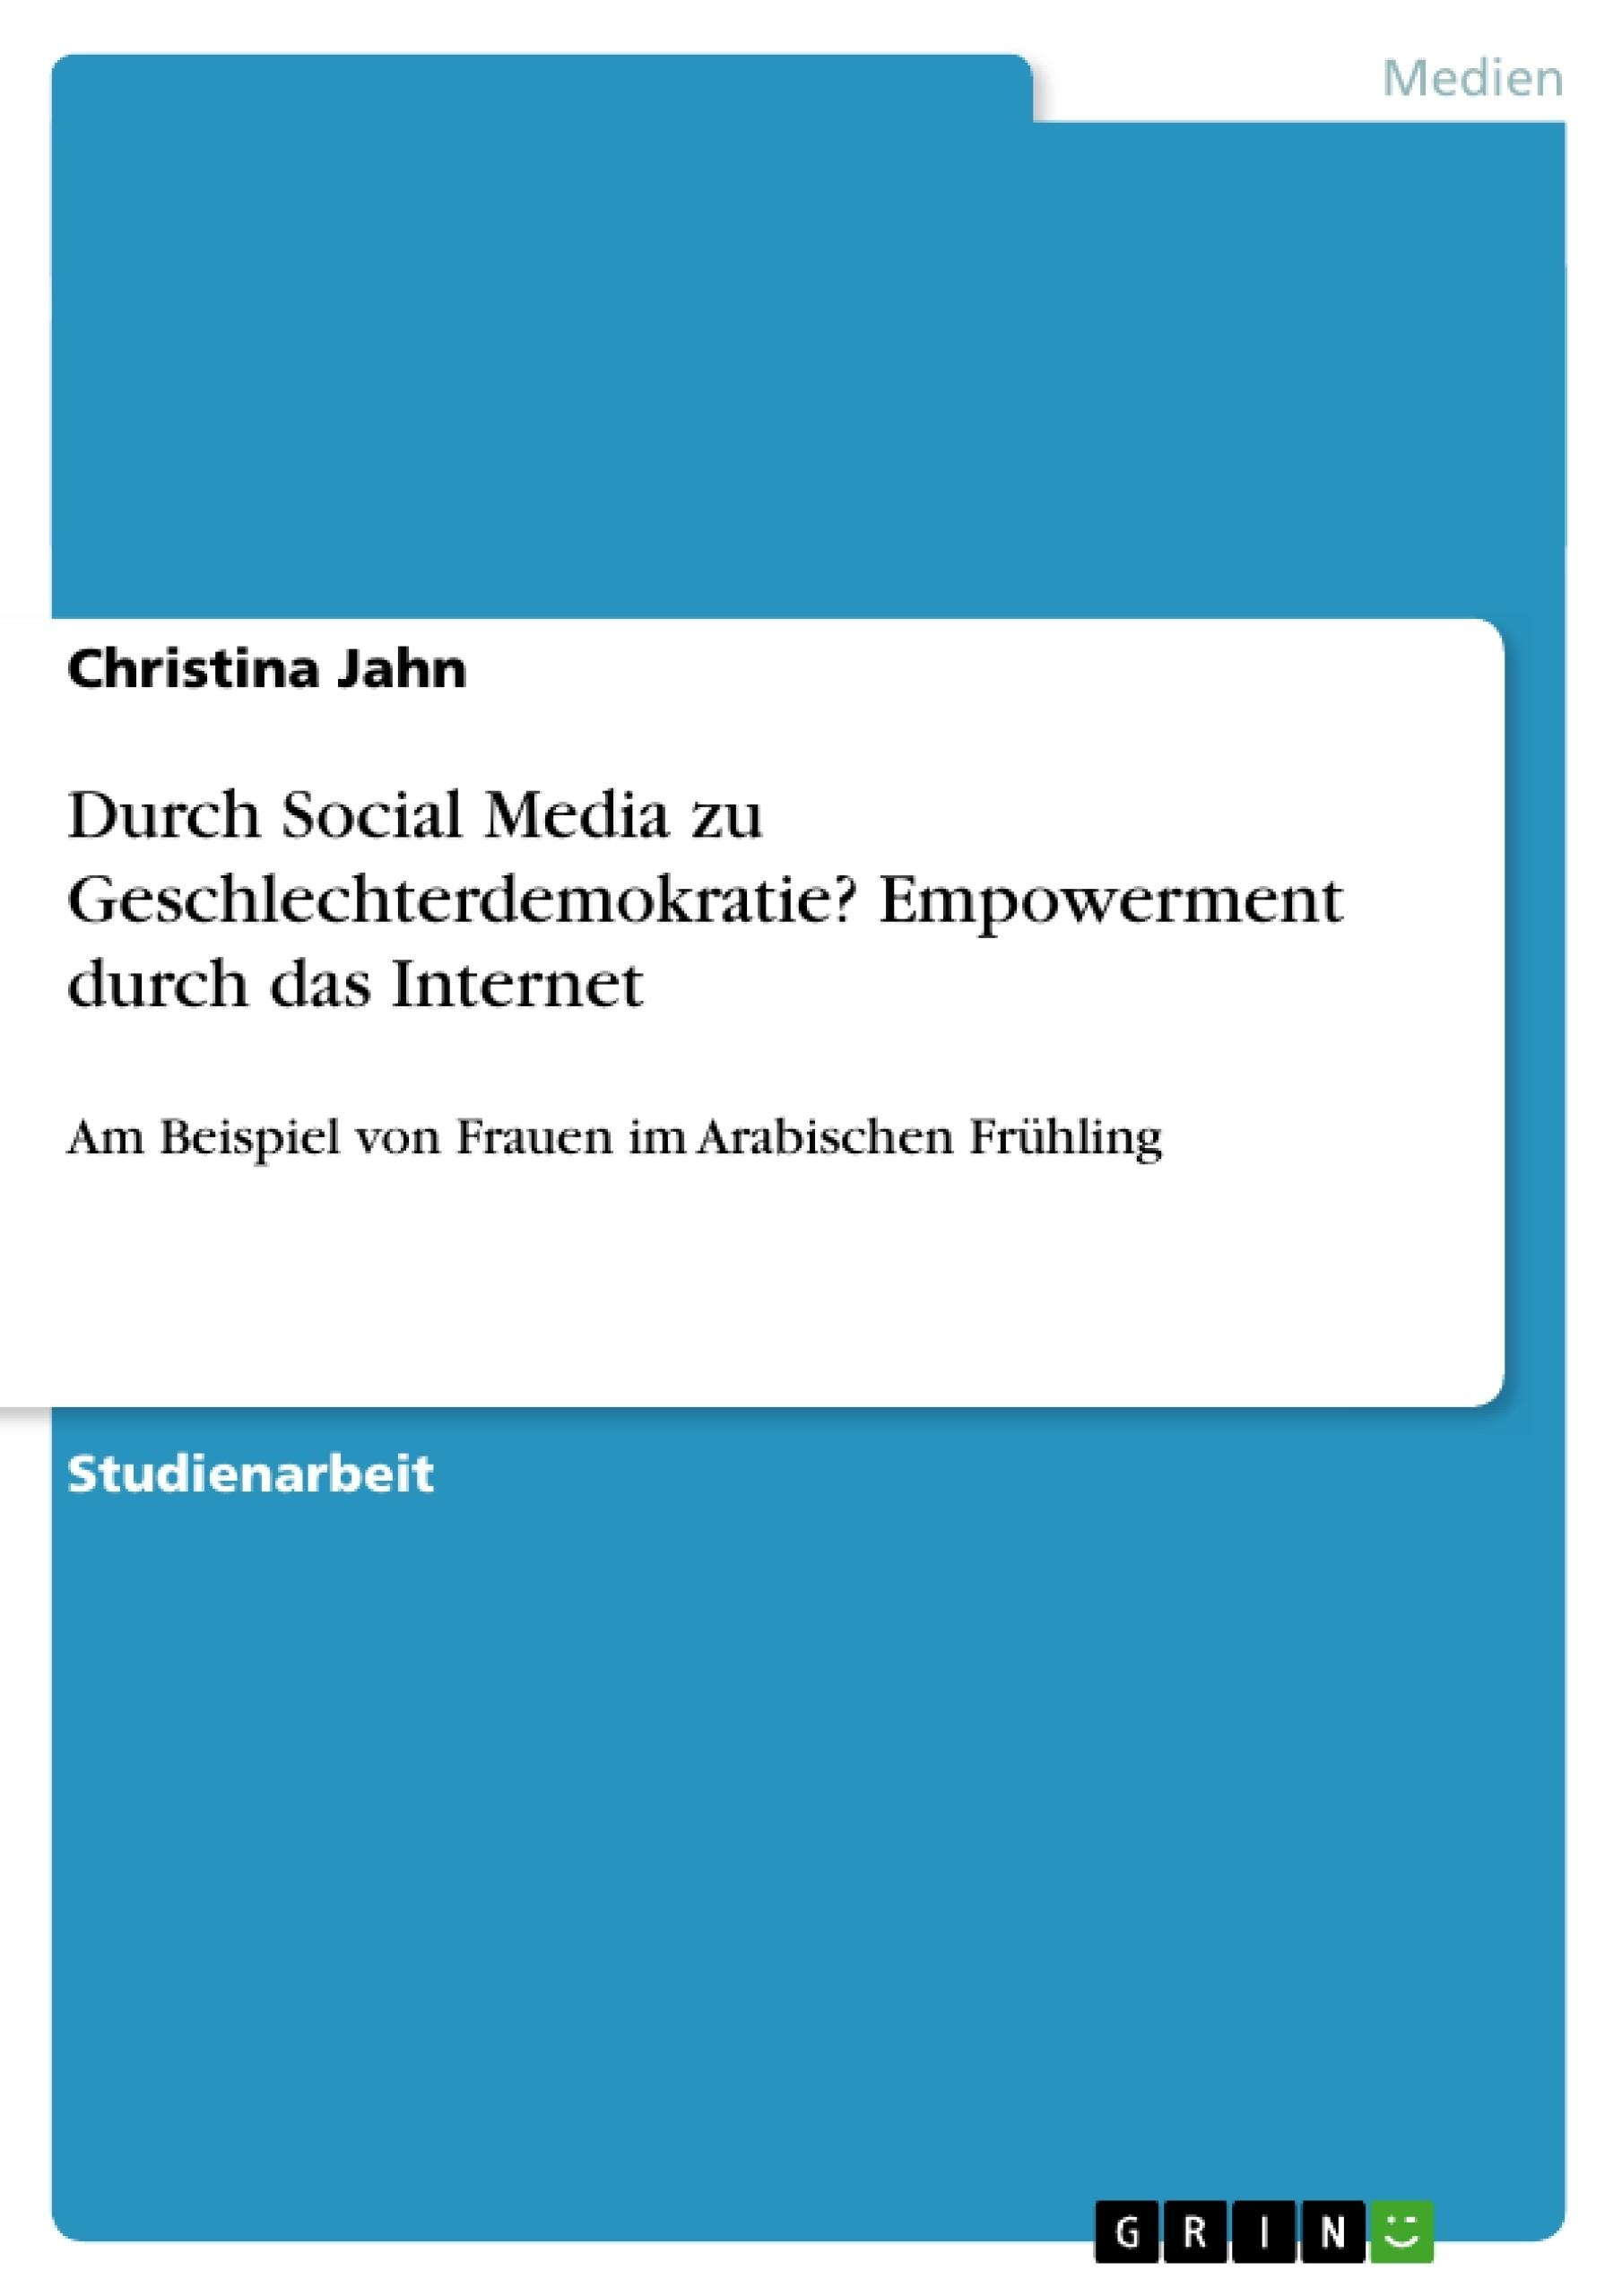 Titel: Durch Social Media zu Geschlechterdemokratie? Empowerment durch das Internet